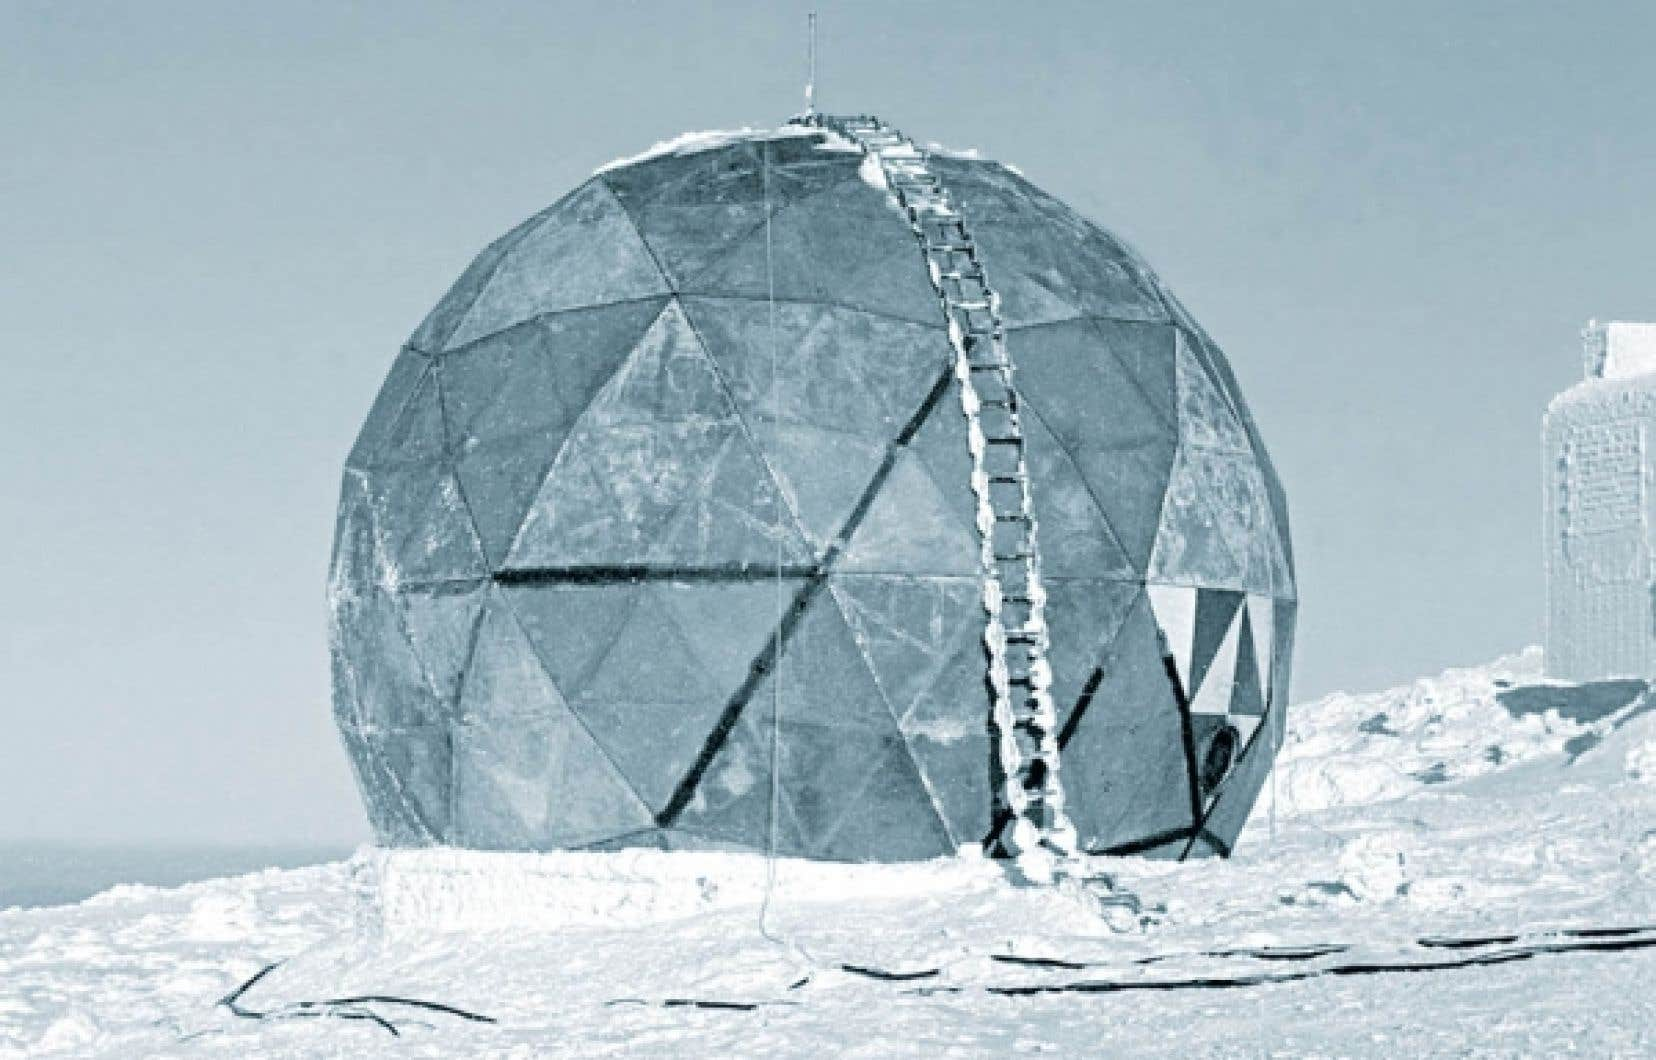 MIT Prototype for First Rigid Radome de R. Buckminster Fuller